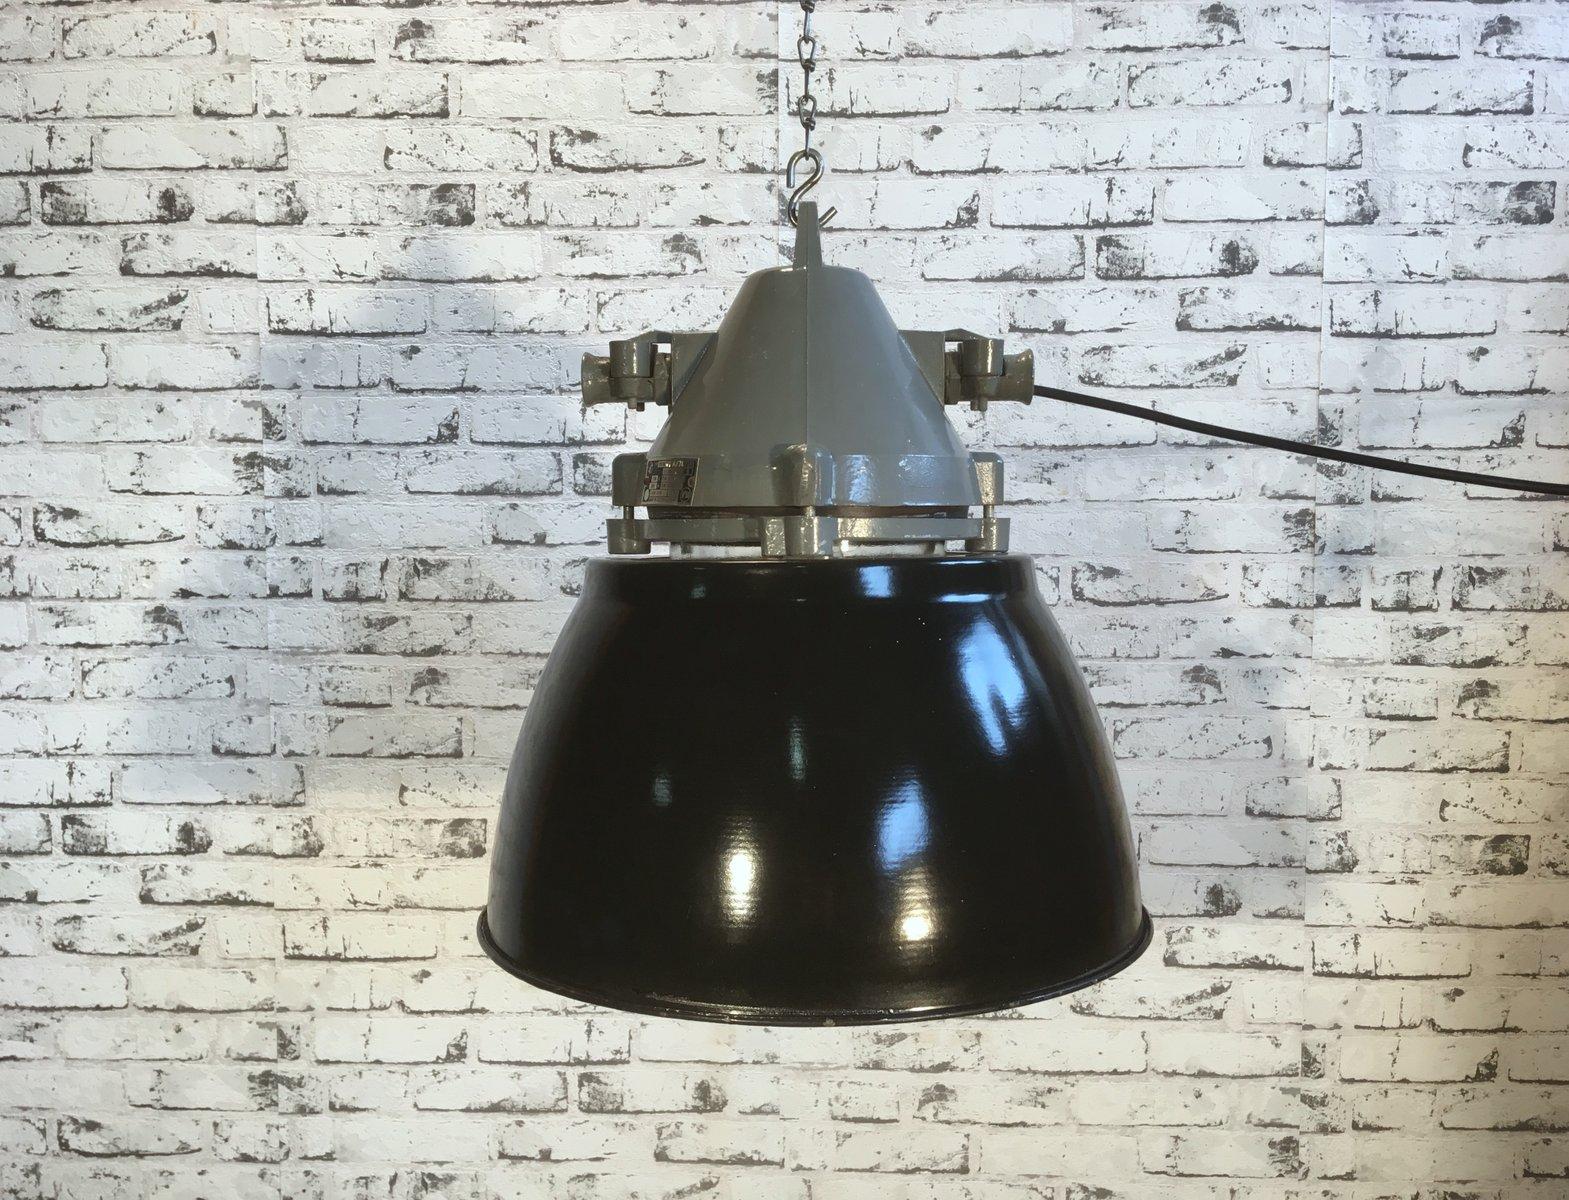 Dunkelgraue Vintage Explosionsgeschützte Aluminium Lampe mit schwarz e...